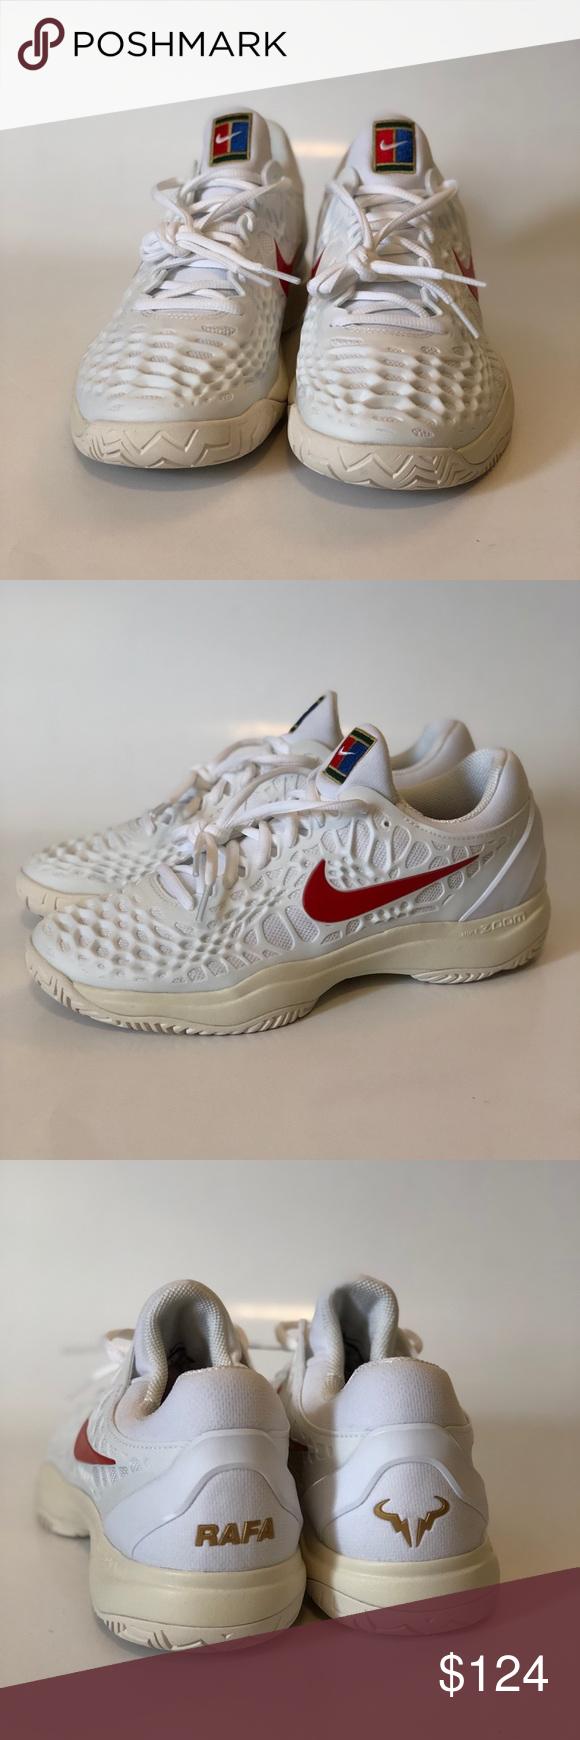 3c073b572926 Nike Air Zoom Cage 3 HC Rafa Nadal Sz 9 Nike Air Zoom Cage 3 HC Rafa ...